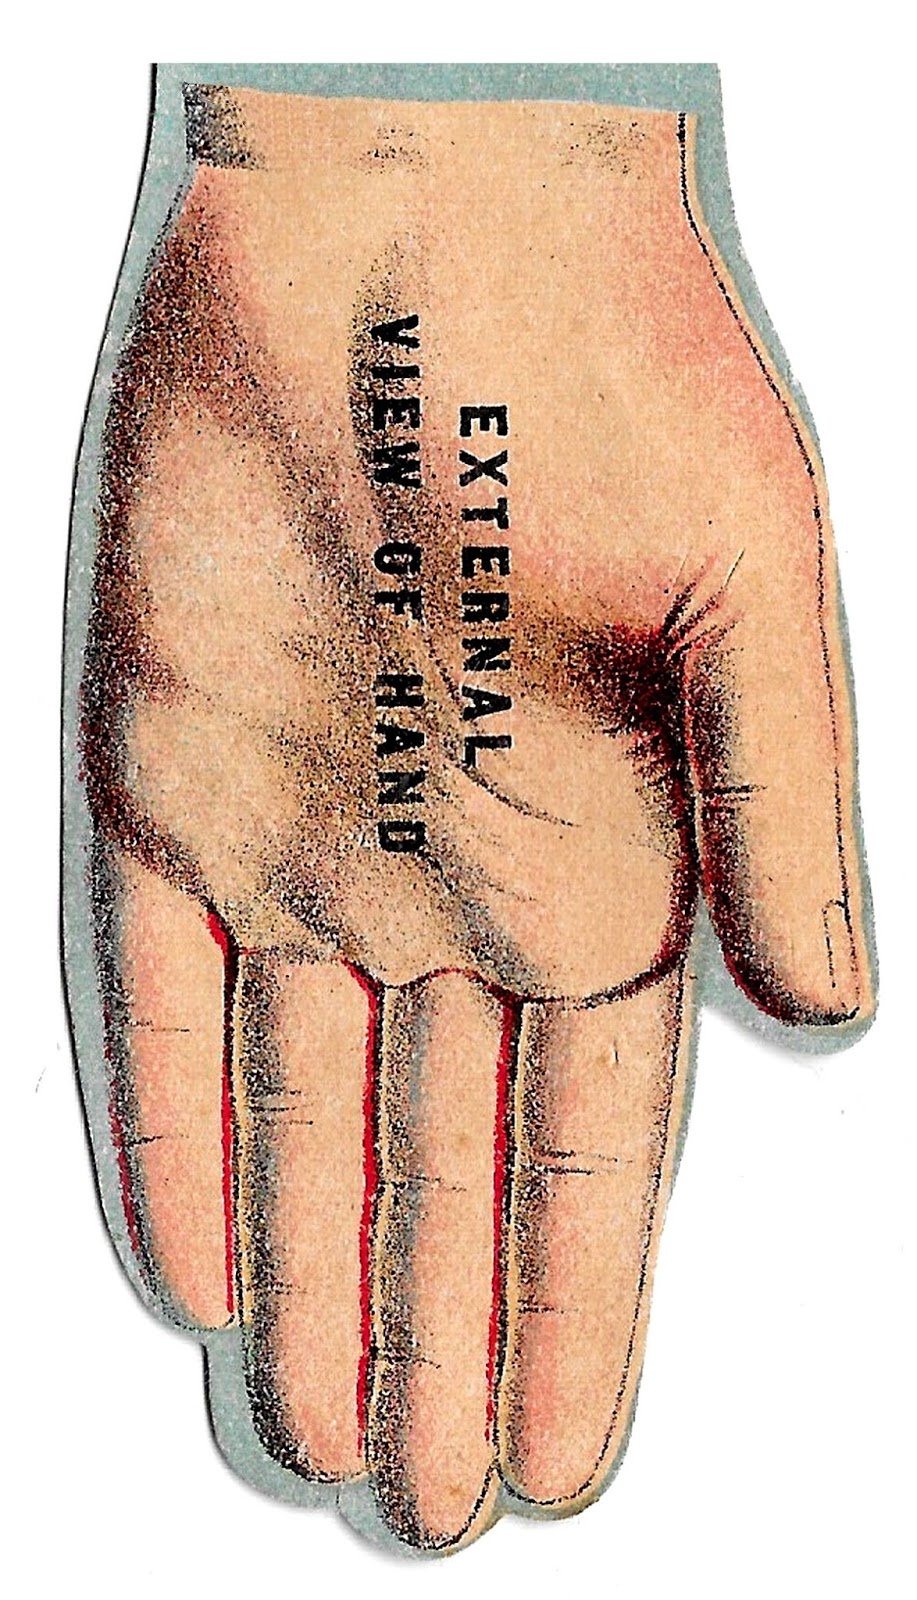 Eyes anatomy clipart png download Antique Images: Free Vintage Human Anatomy Illustration Images Eye ... png download